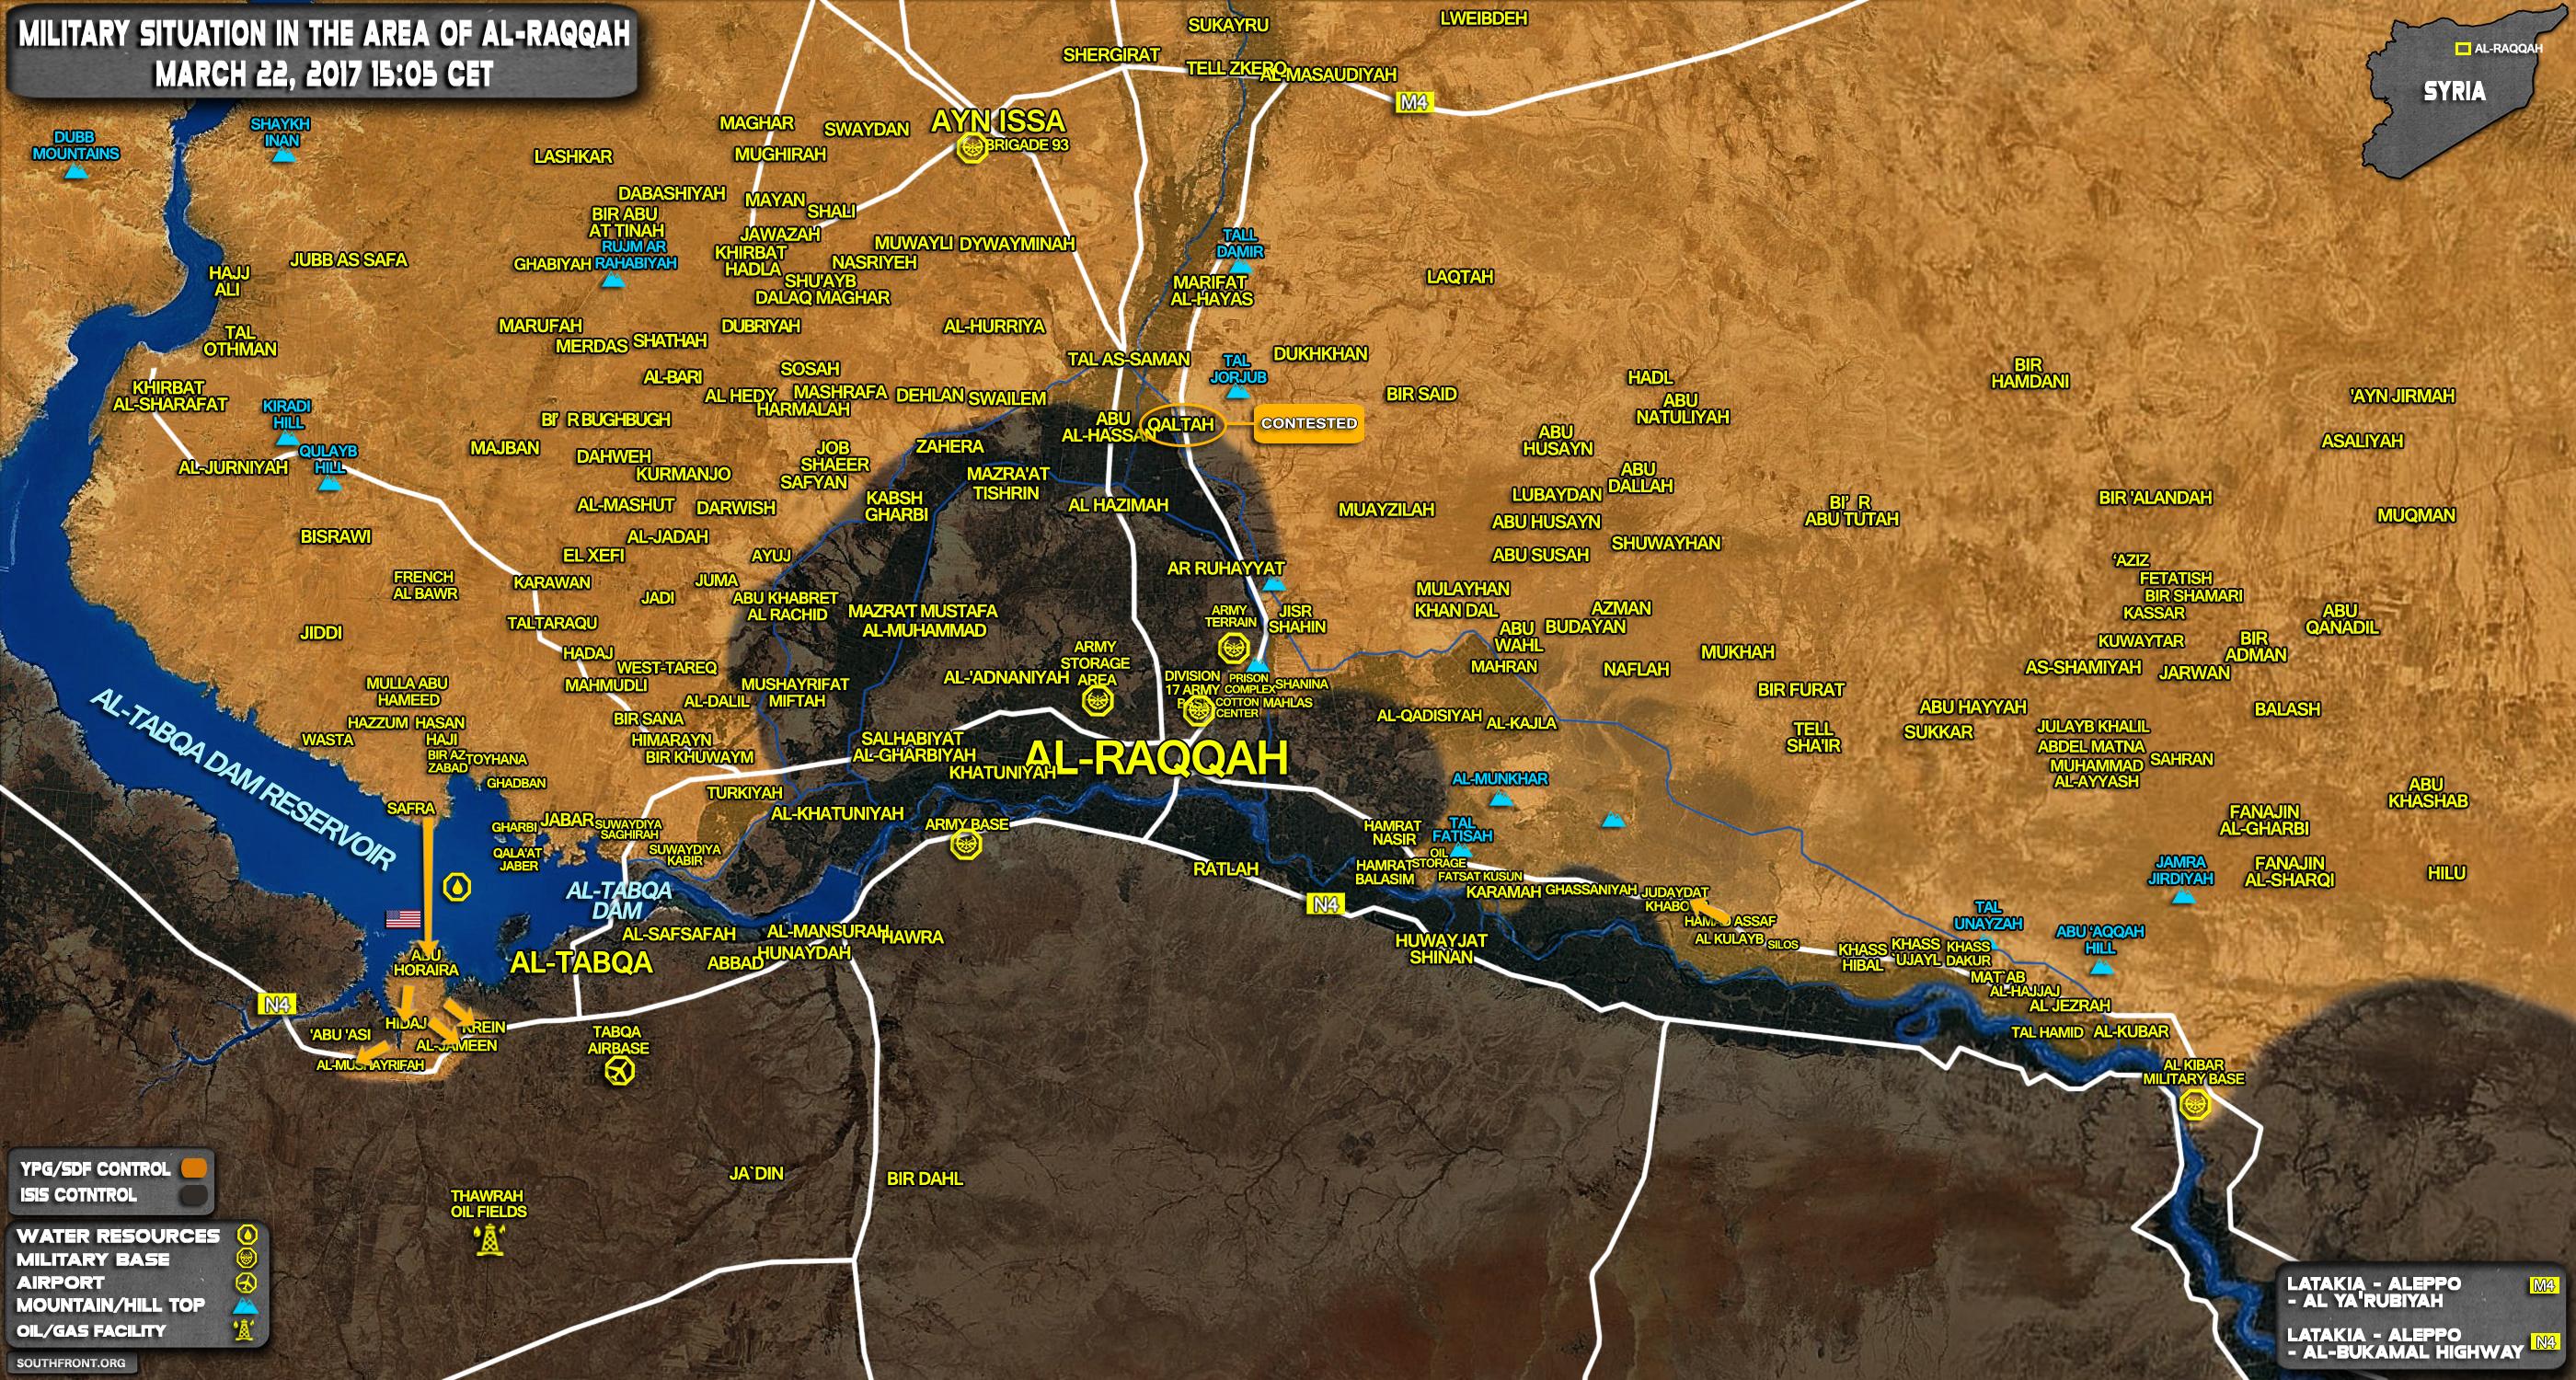 22m_15-05_Al-Raqqah_Syria_War_Map.jpg